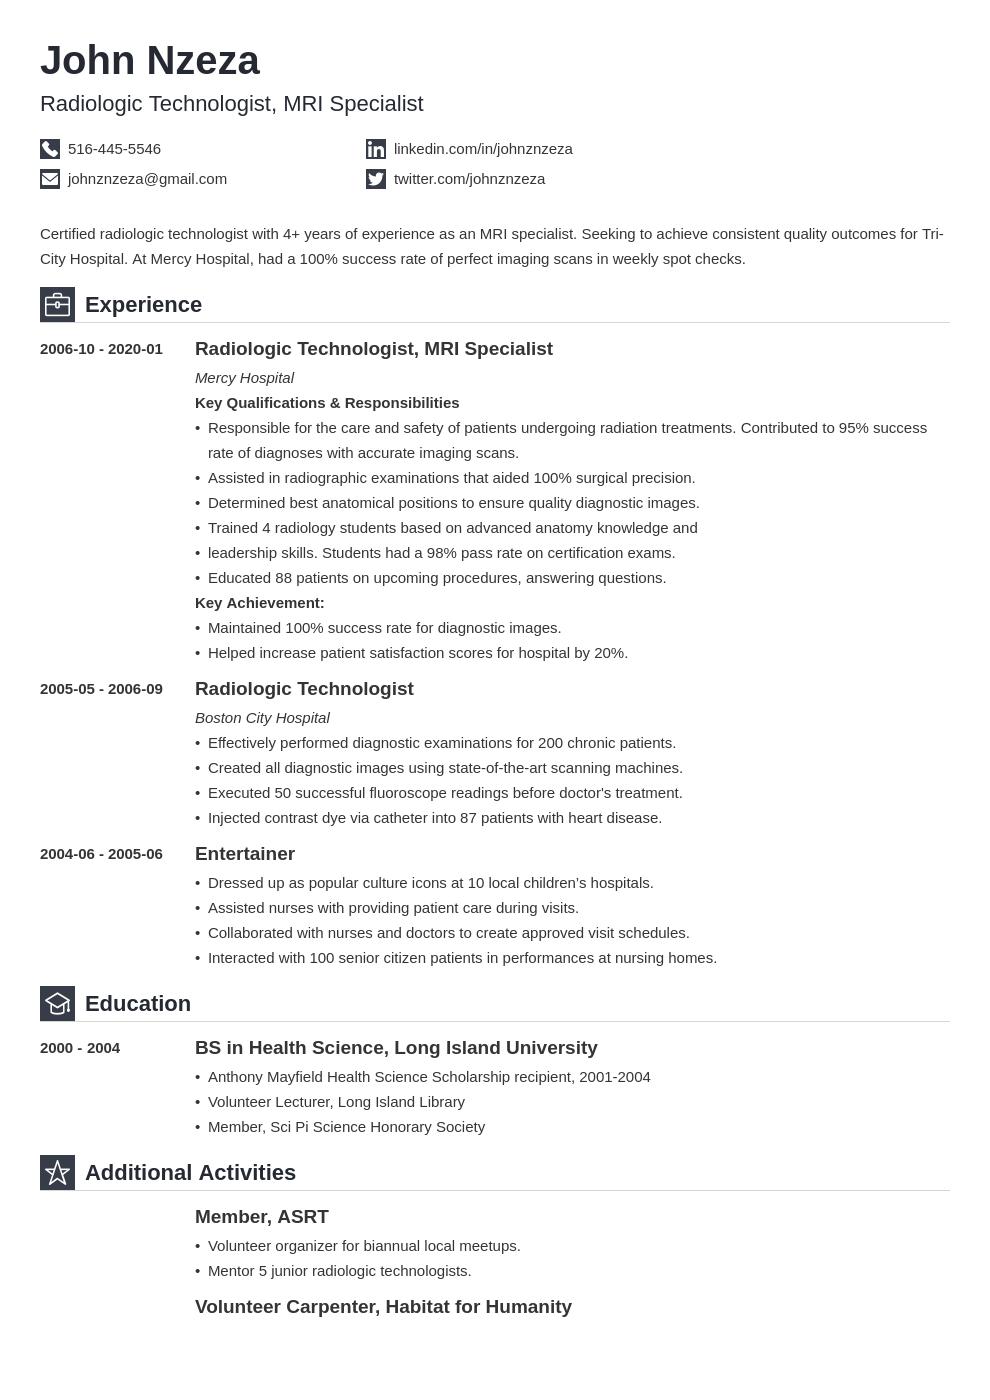 Radiologic Technologist Resume Example Template Iconic Radiology Technologist Resume Examples Job Resume Examples